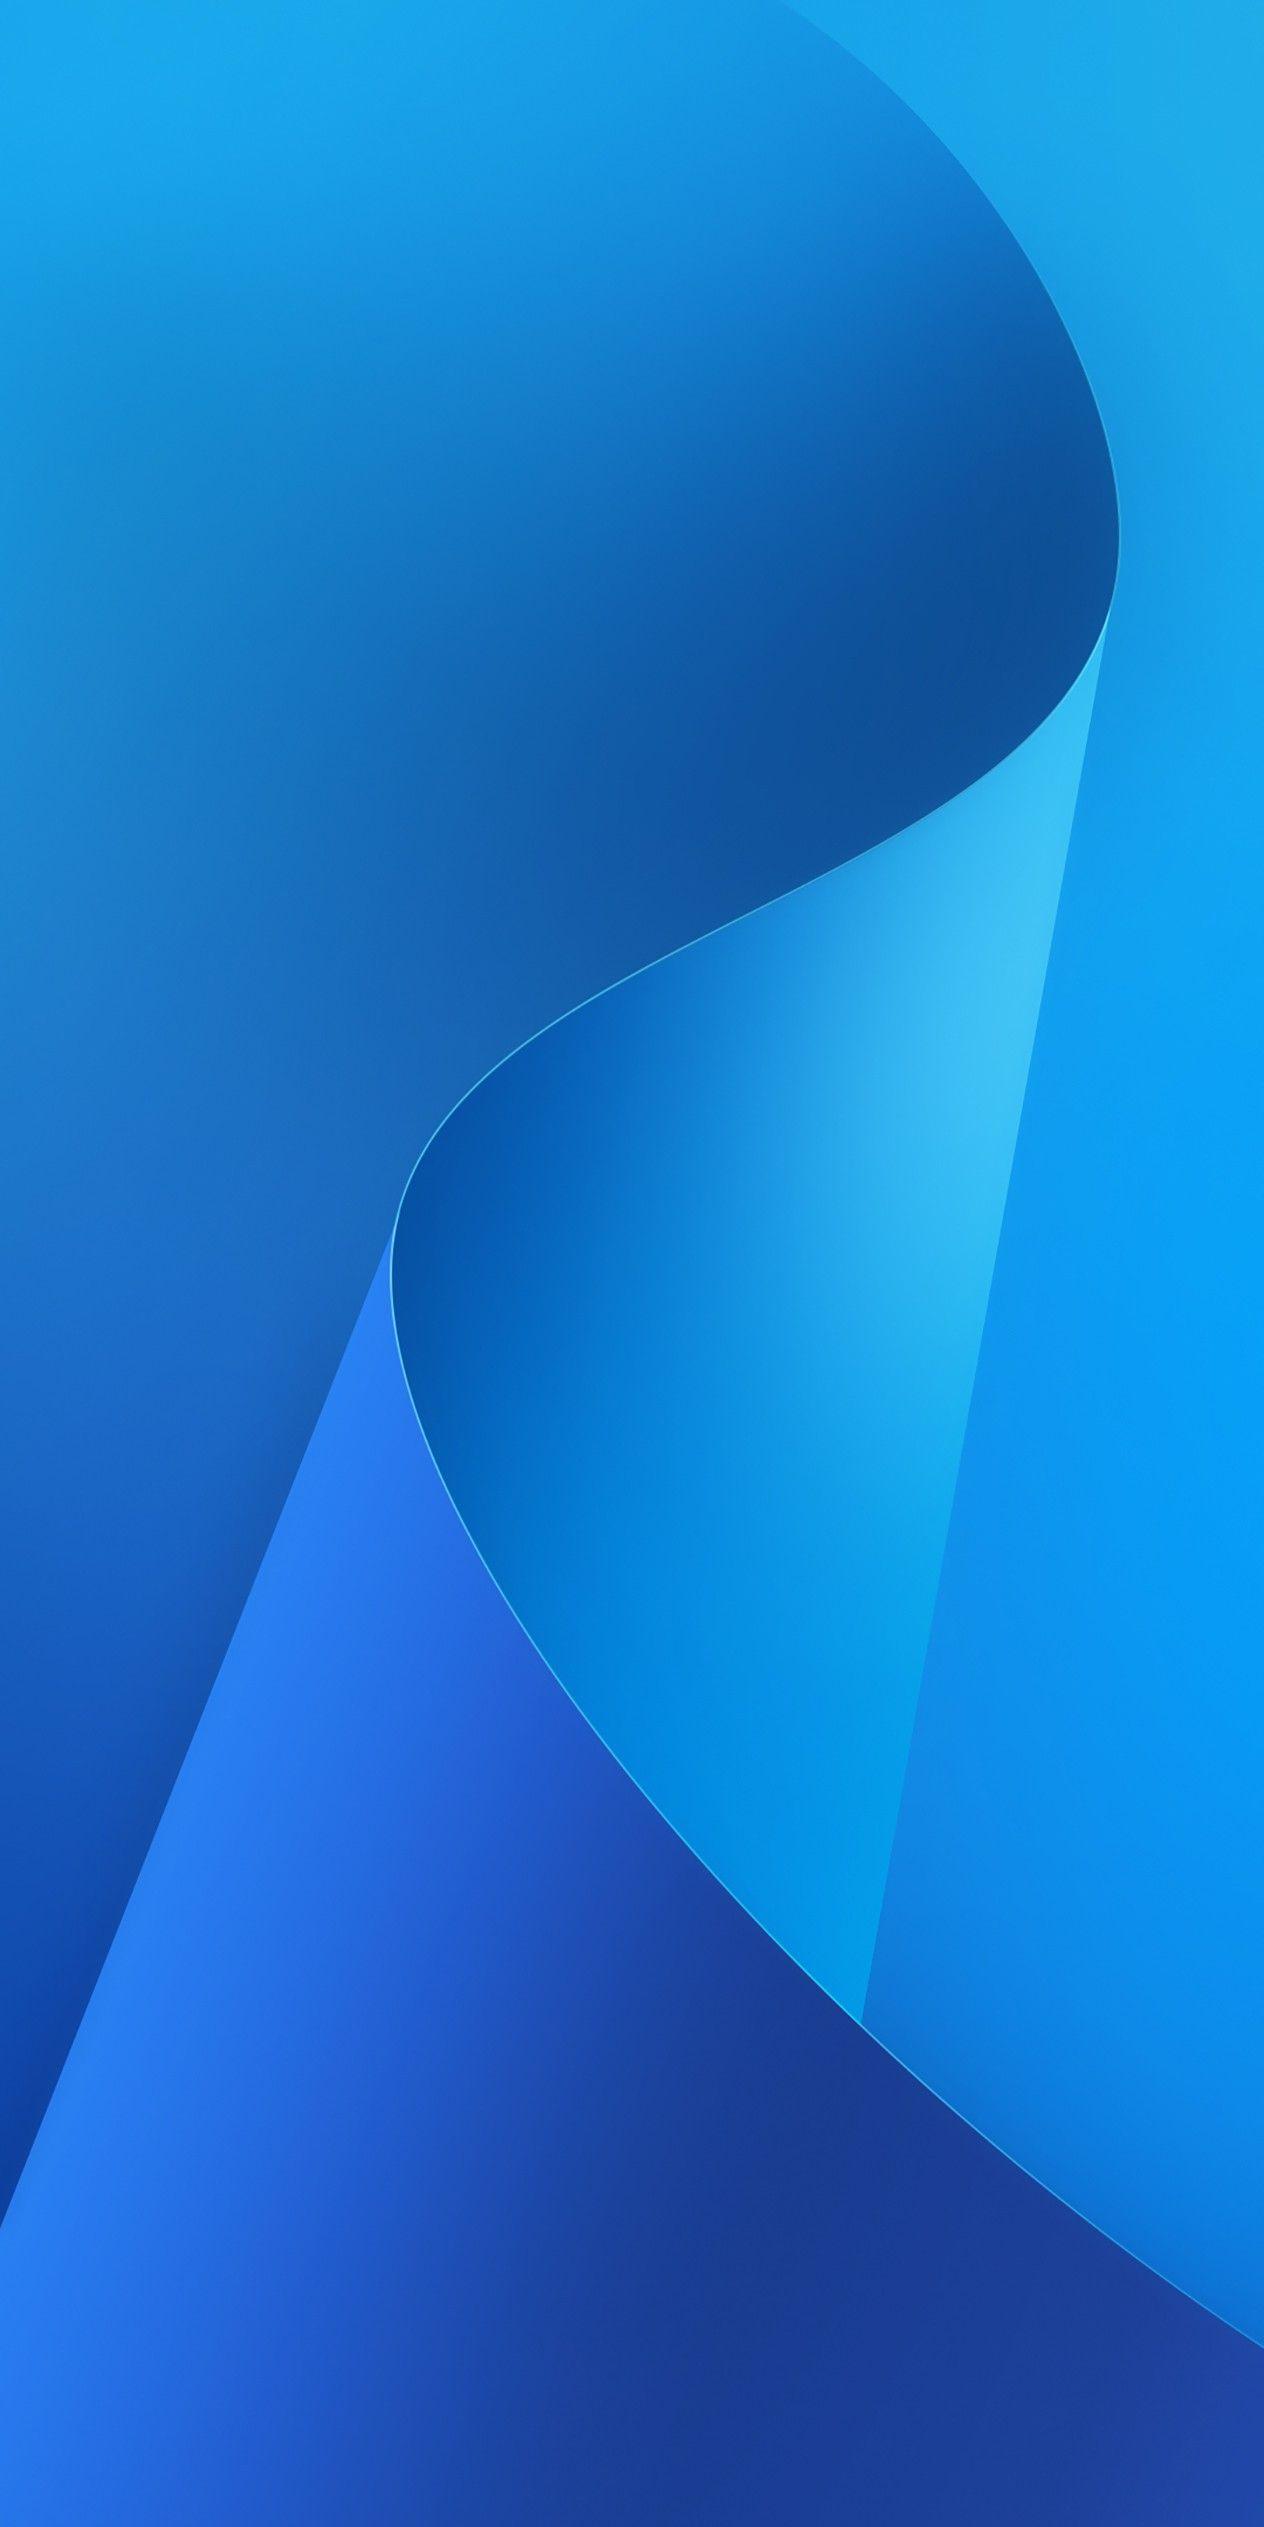 Wallpaper Background Texture Patterns Of Blue Color For Mobile Handphone Wallpaper B Samsung Wallpaper Geometric Wallpaper Iphone Iphone Homescreen Wallpaper